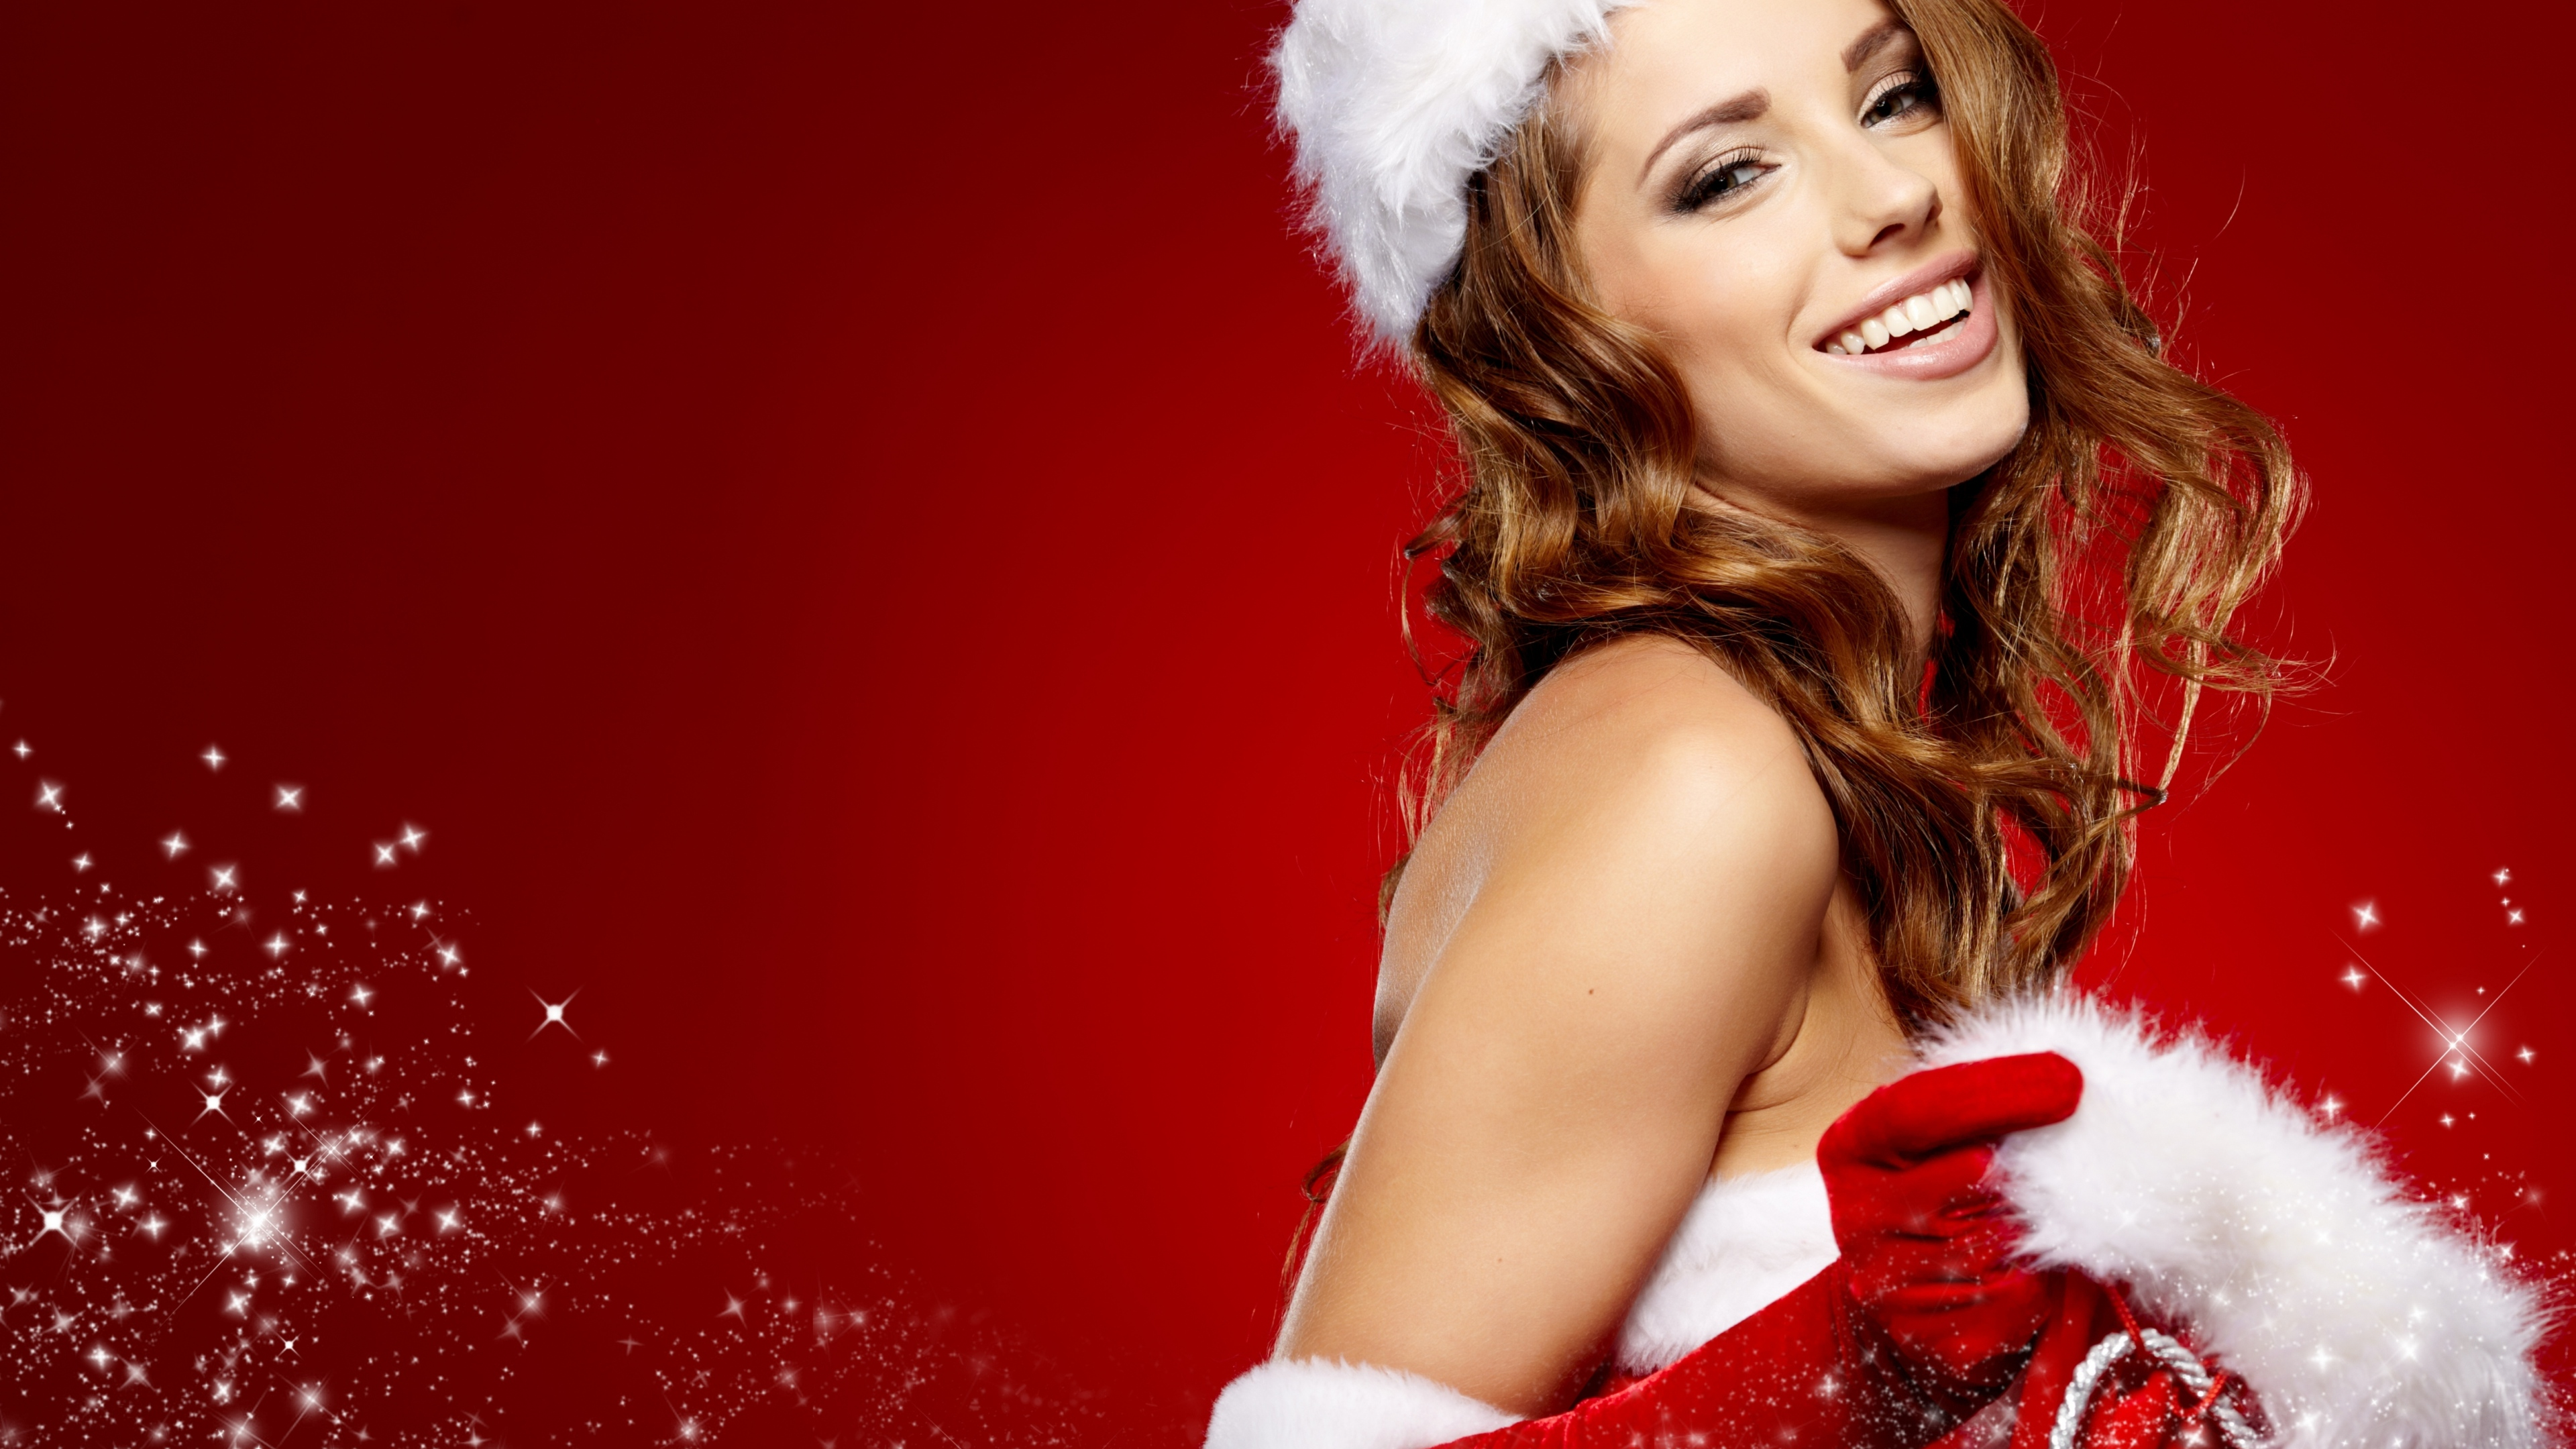 Mensajes de Navidad picantes